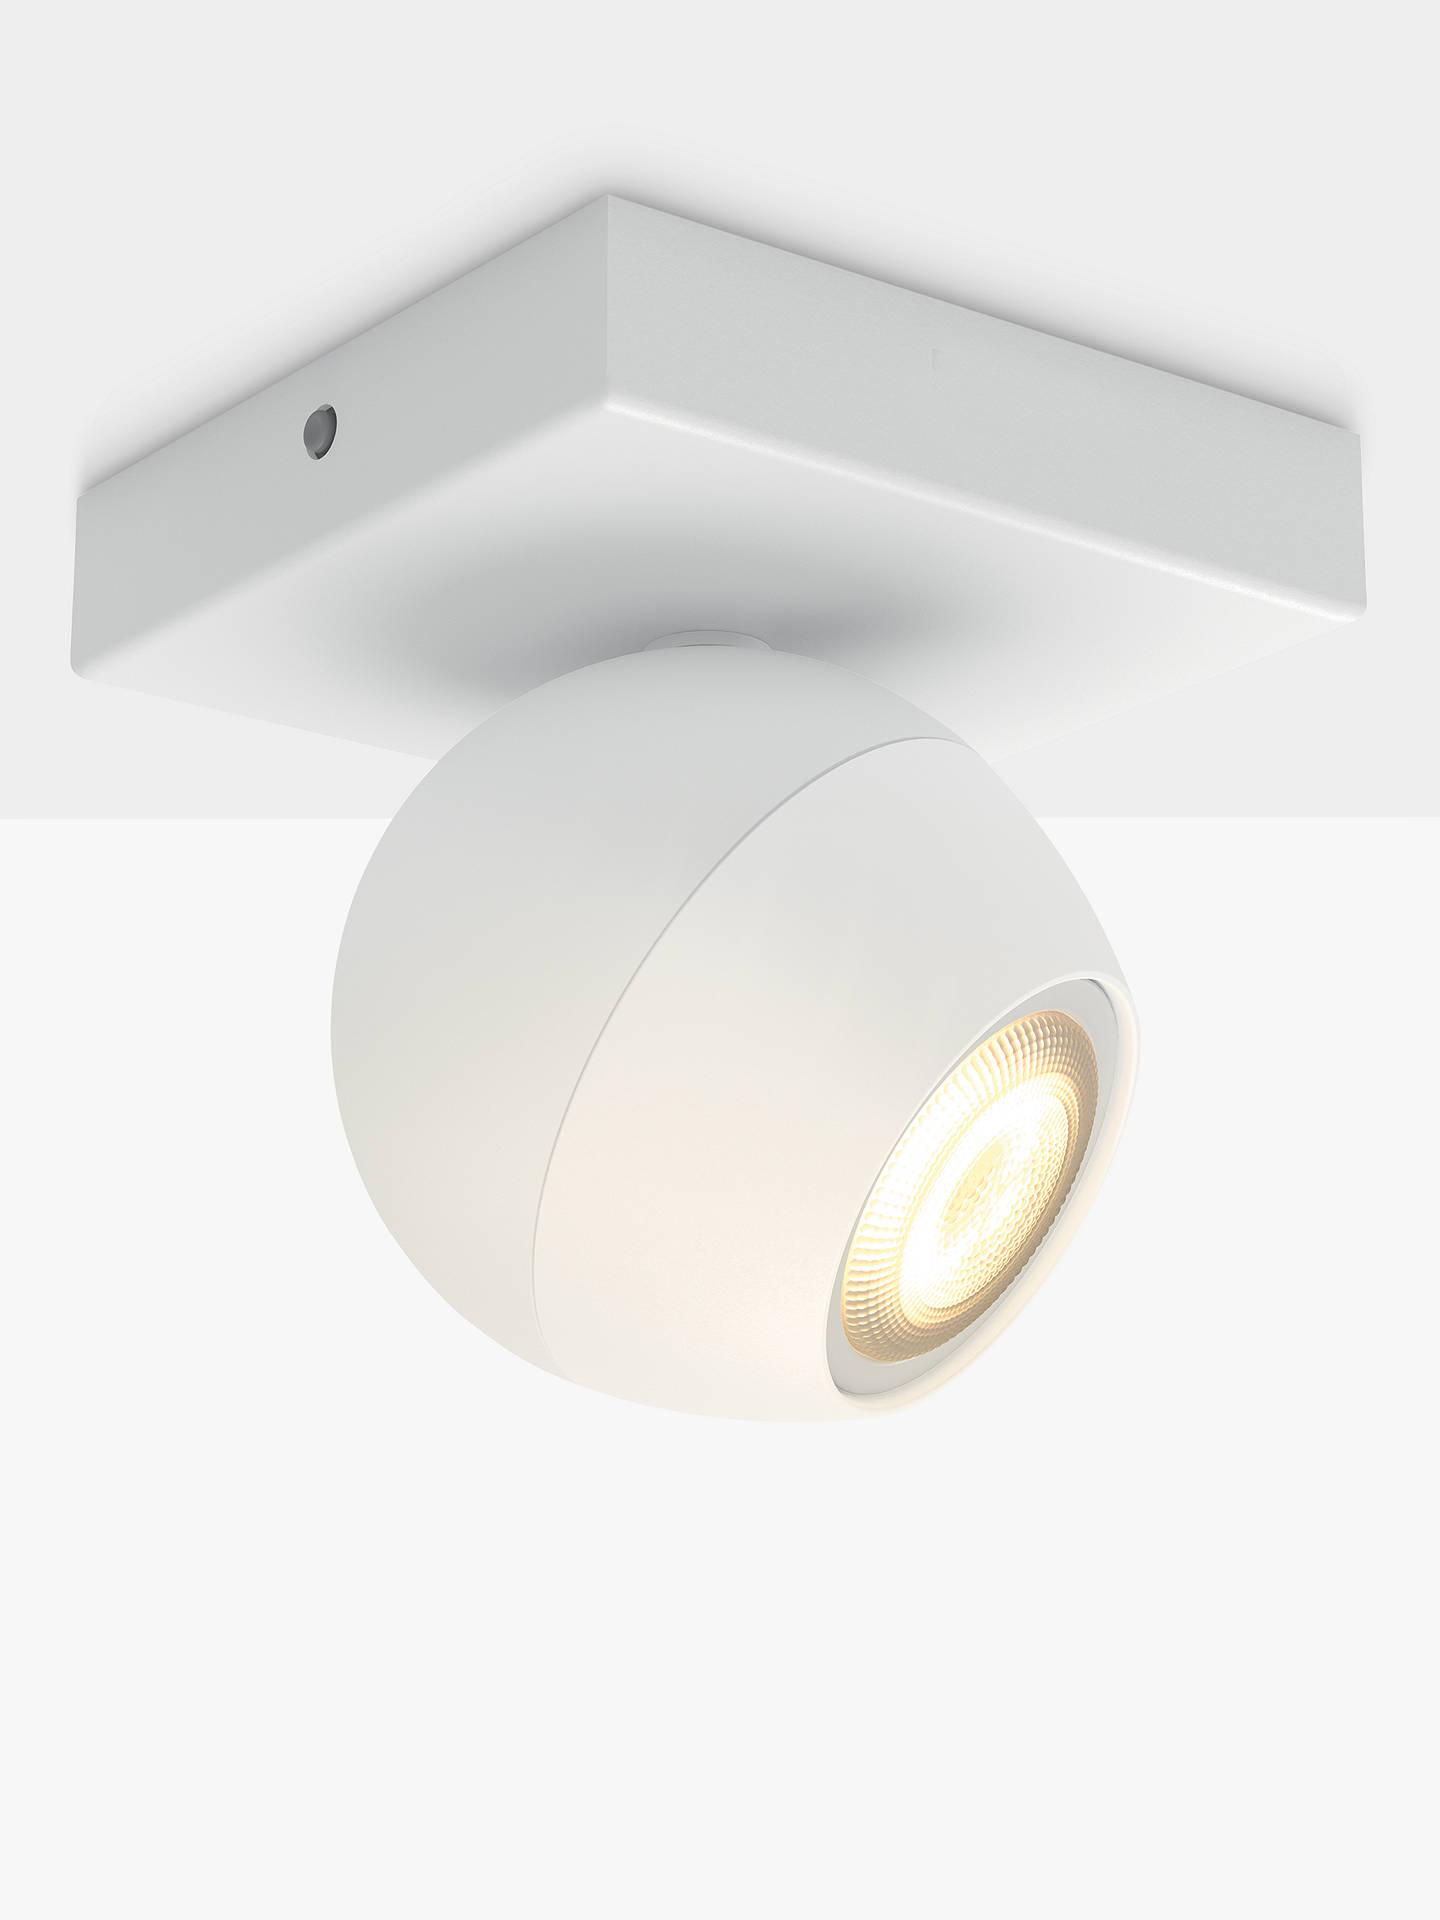 Philips Hue Ambiance Buckram Led Single Spotlight Extension White Antler Lamp Wiring Kit Buyphilips Online At